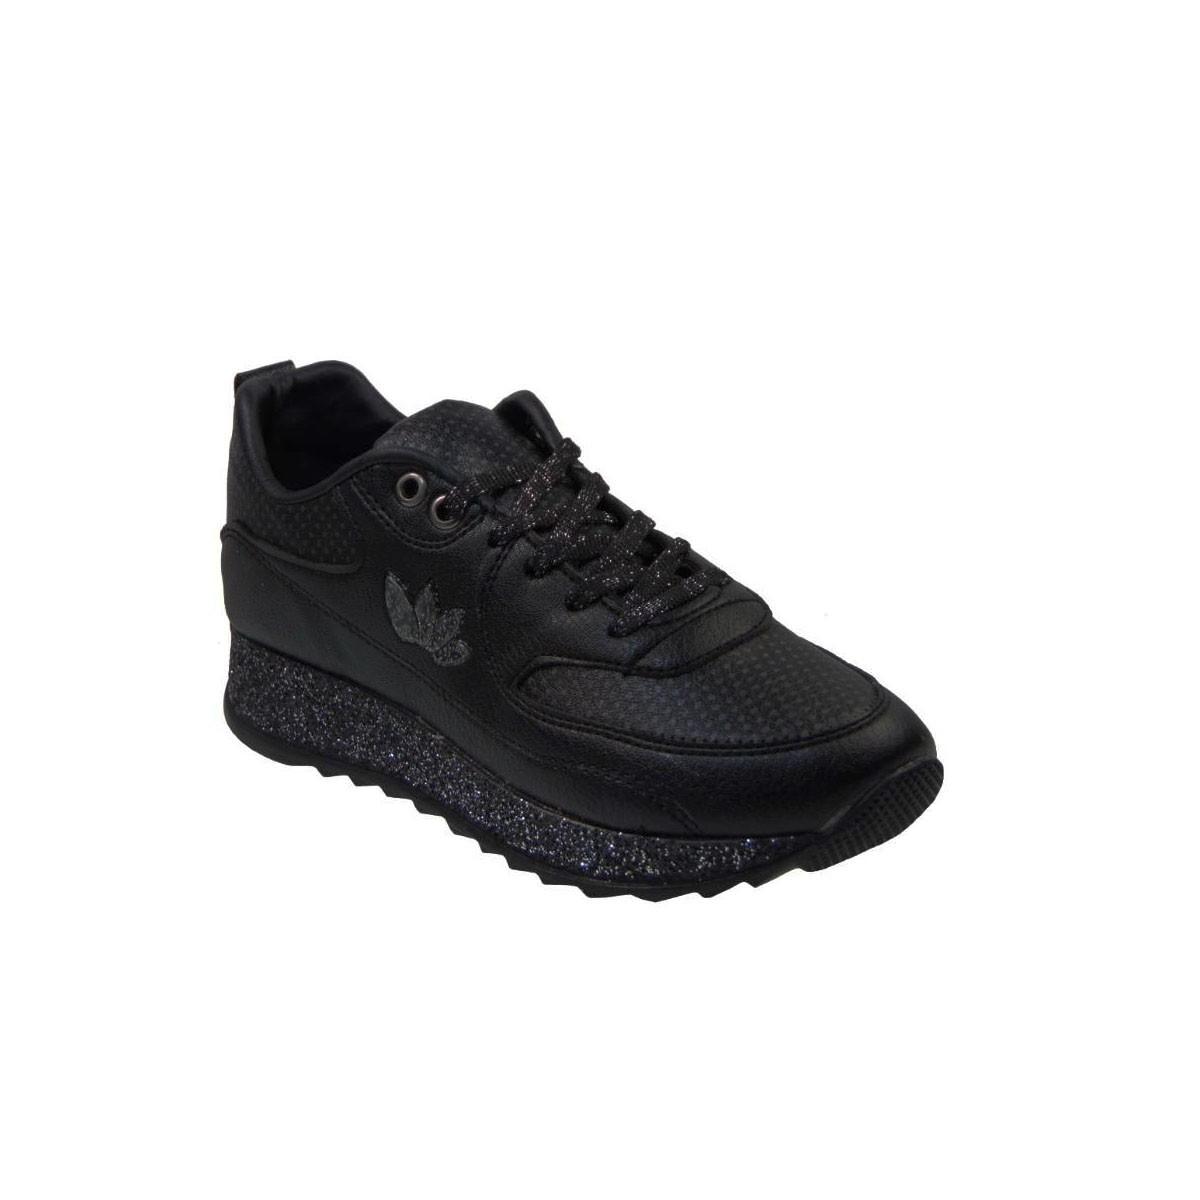 527ec6e79a7 Tsimpolis Shoes 104 Αθλητικό Γυναικείο Από Τεχνοδέρμα Μαύρο ...